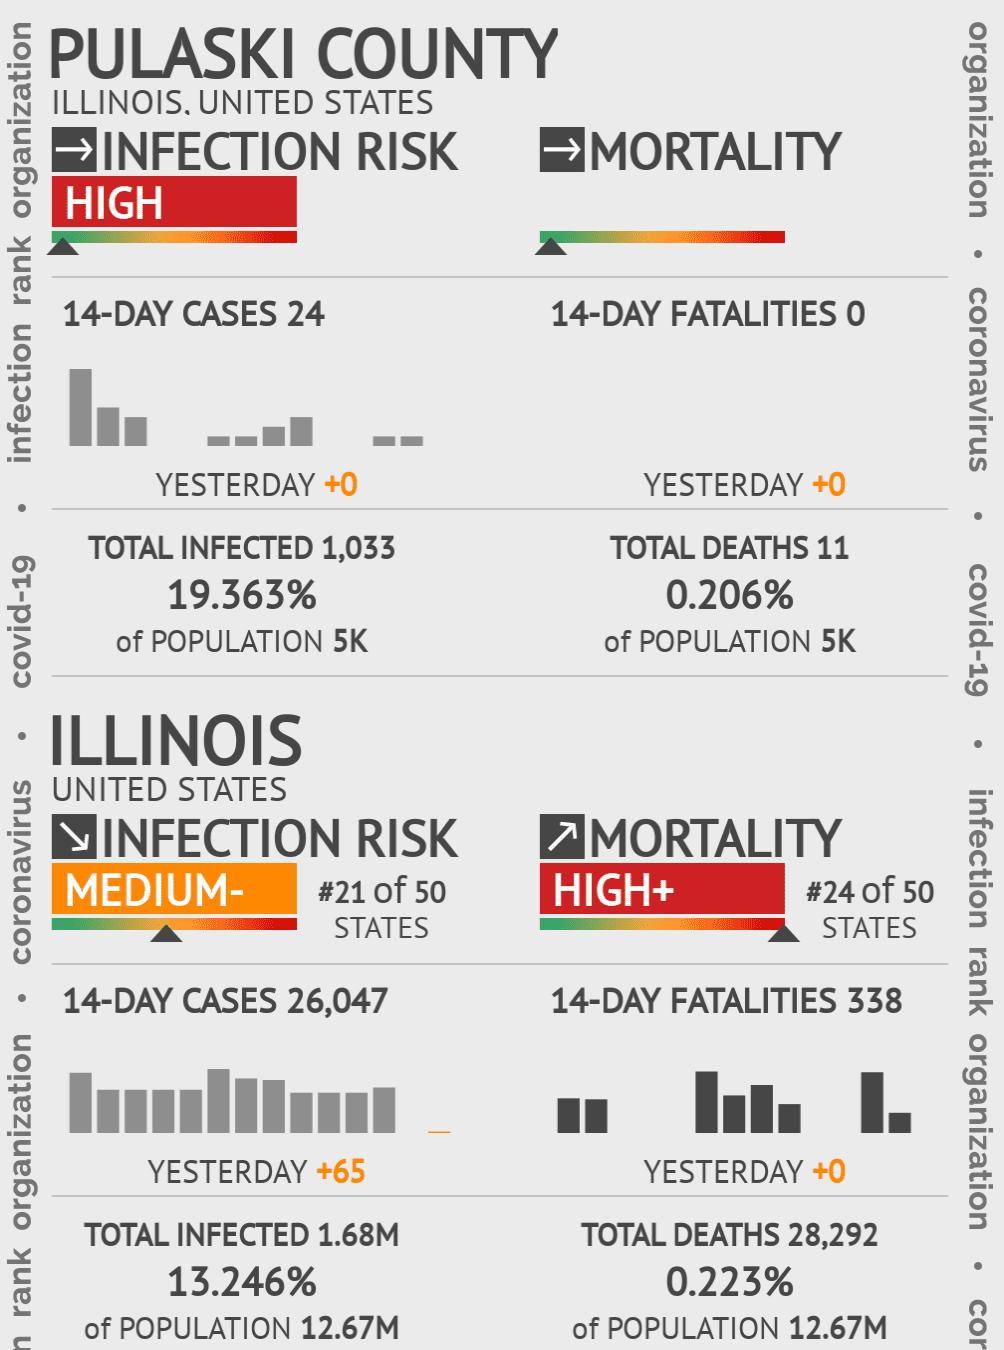 Pulaski County Coronavirus Covid-19 Risk of Infection on October 16, 2020